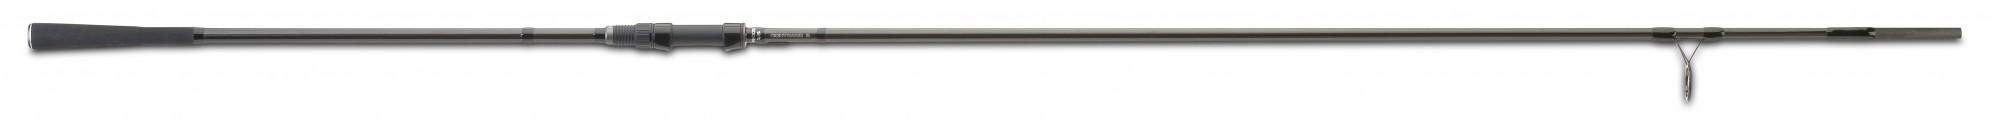 anaconda-nighthawk-2-12ft-3-60m-3-50lb-2t-karpfenrute